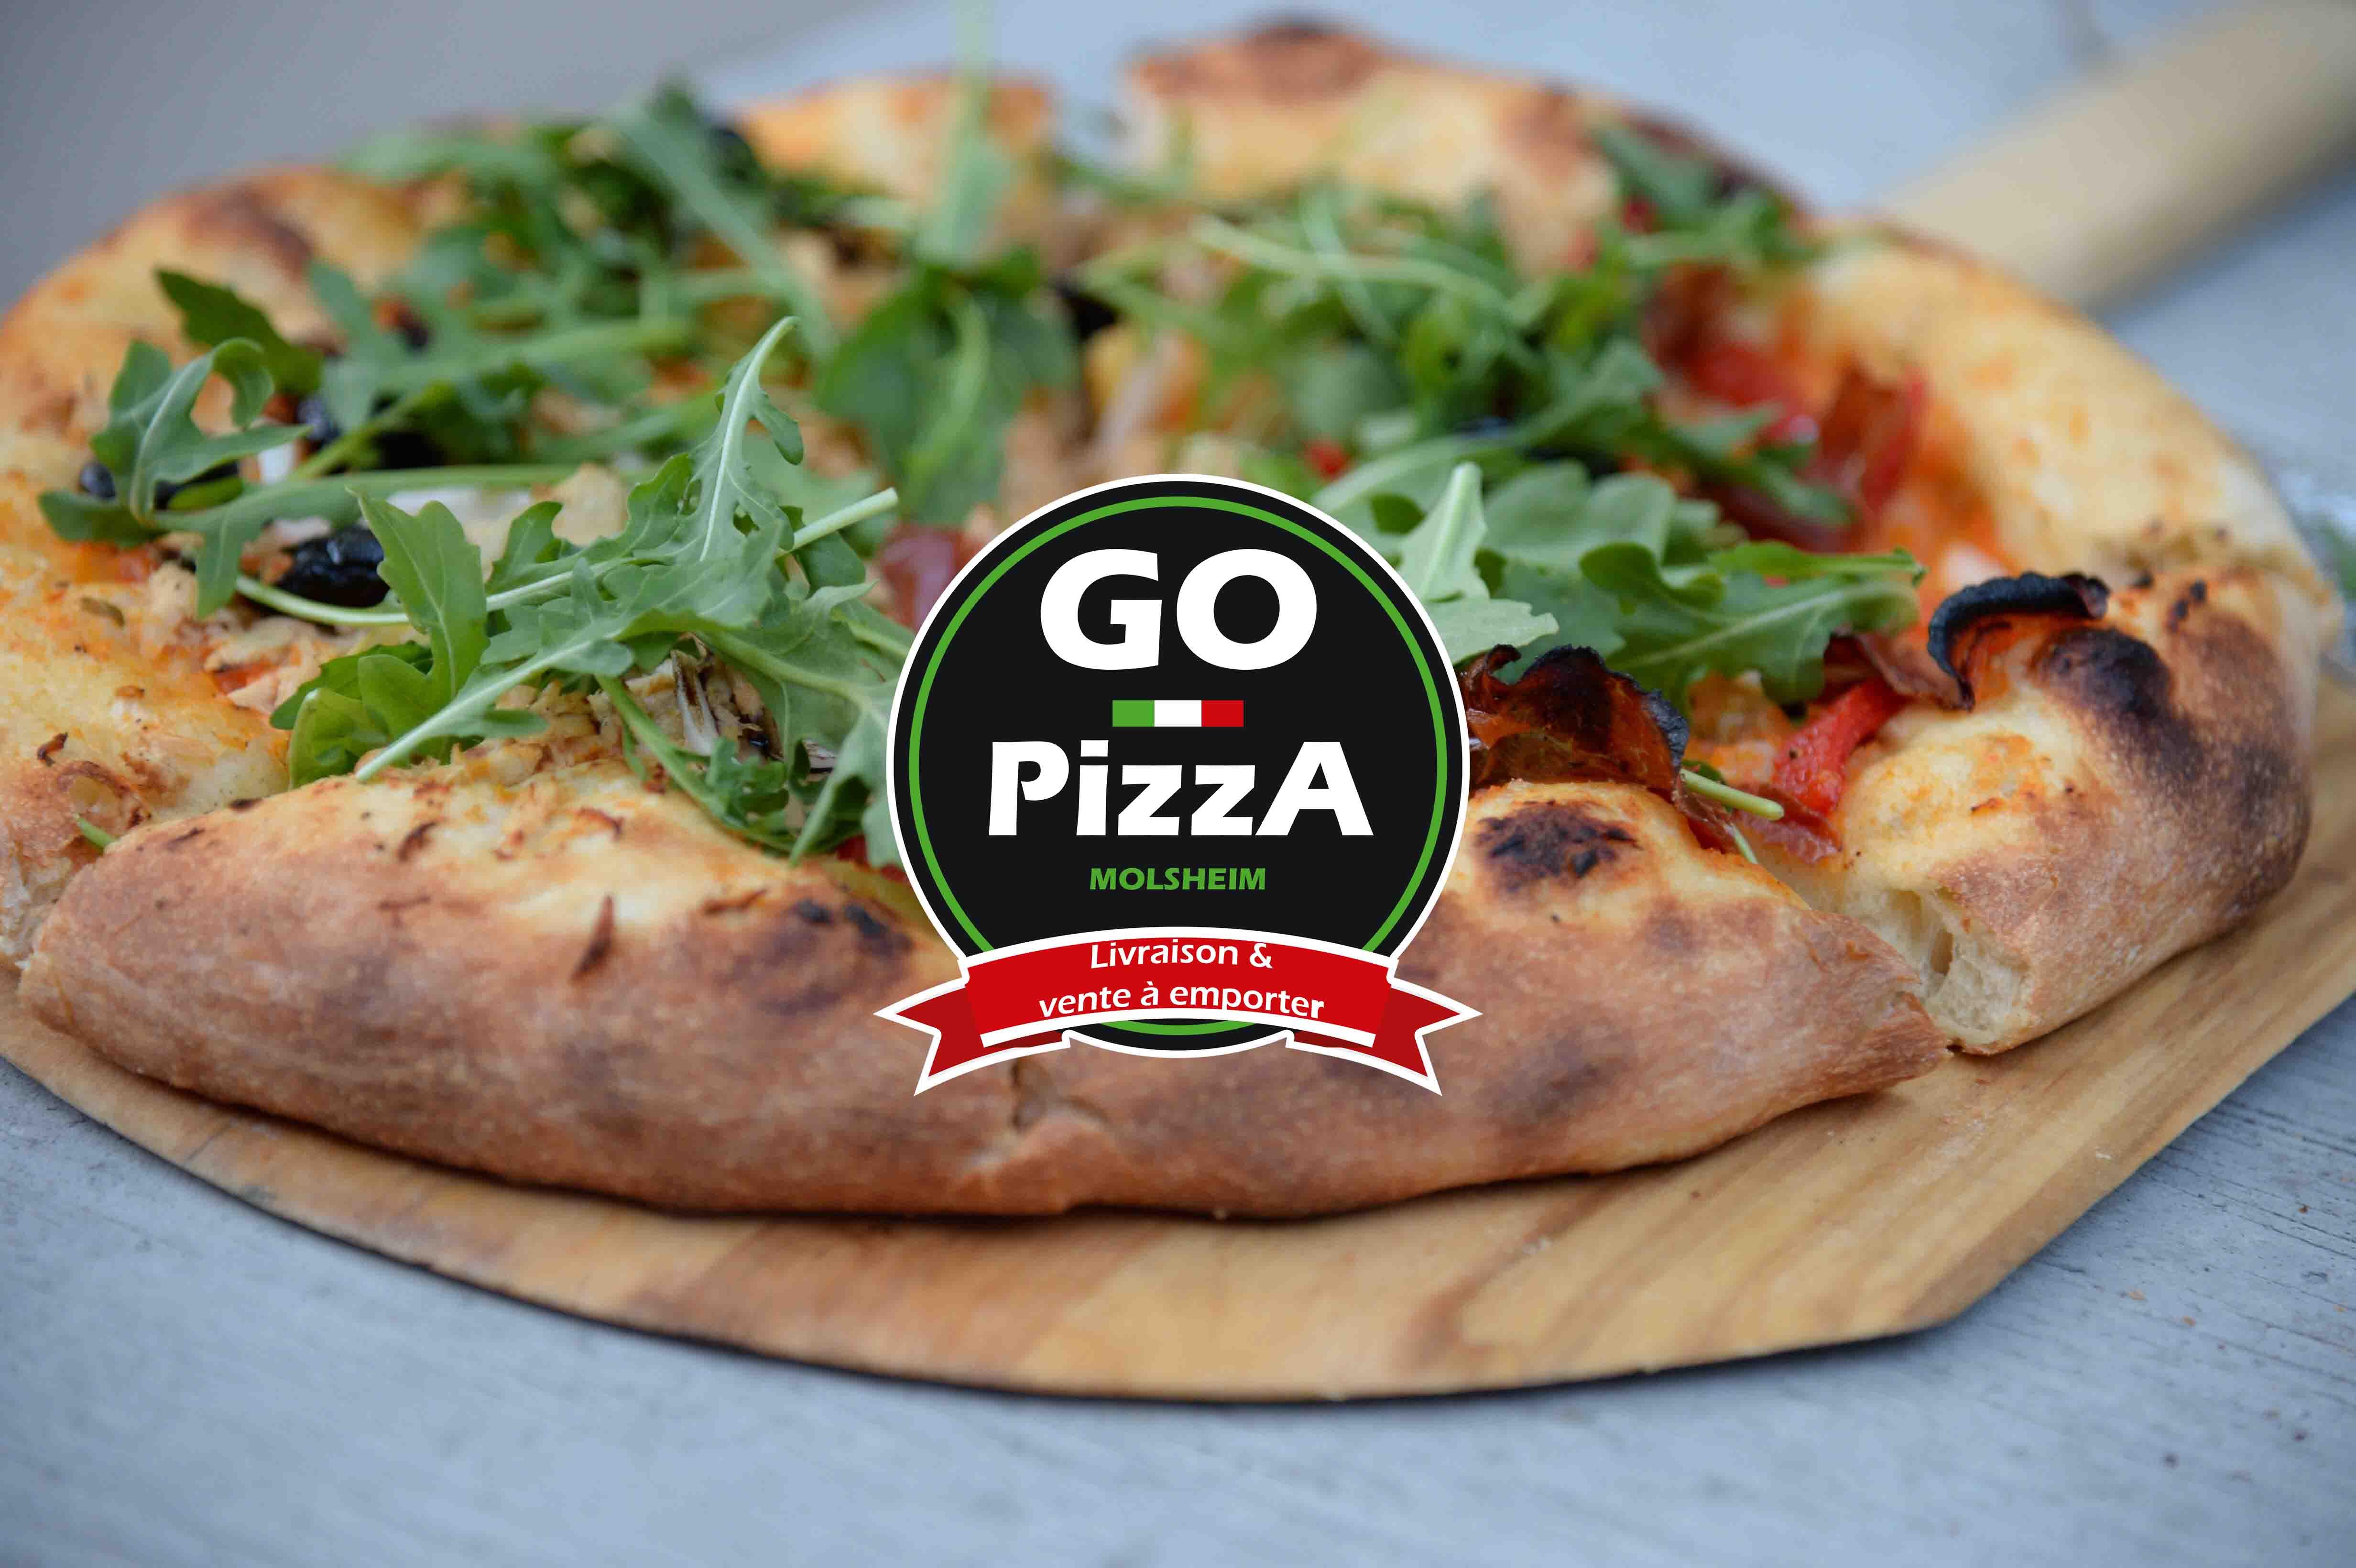 Go pizza molsheim